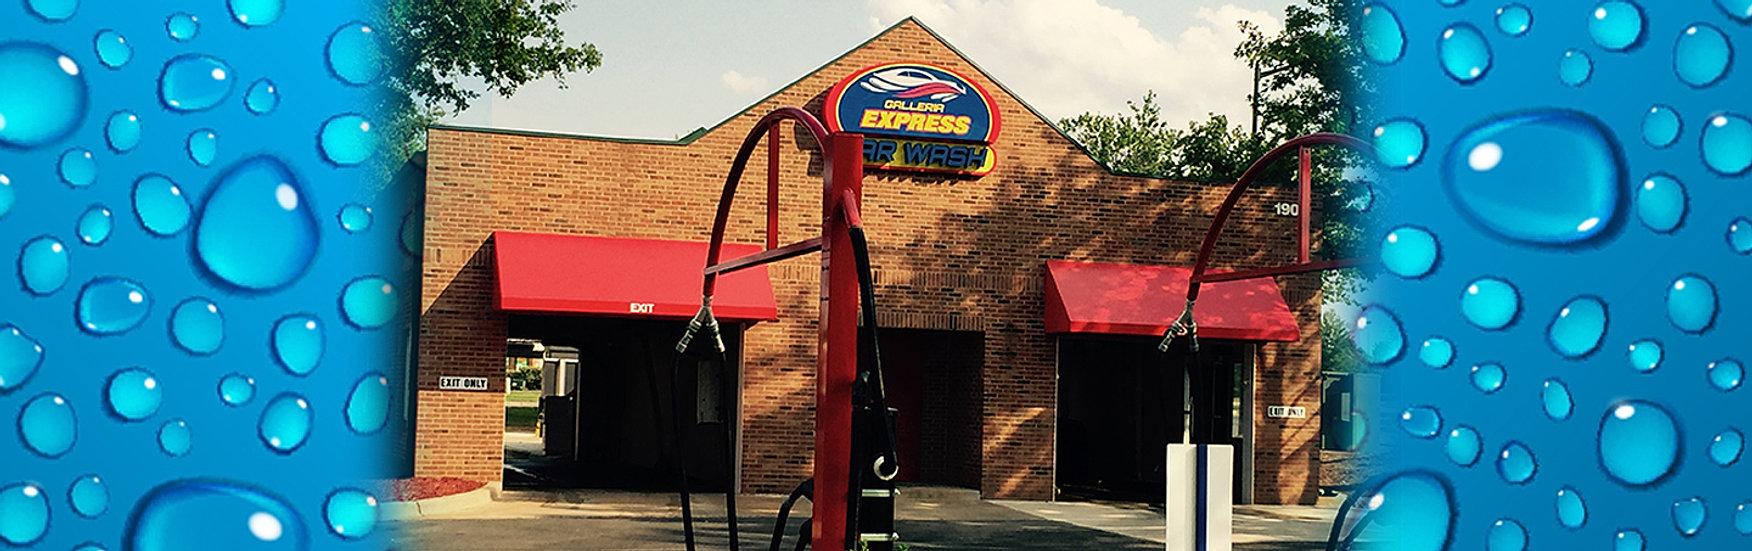 Galleria Express Car Wash Charlotte